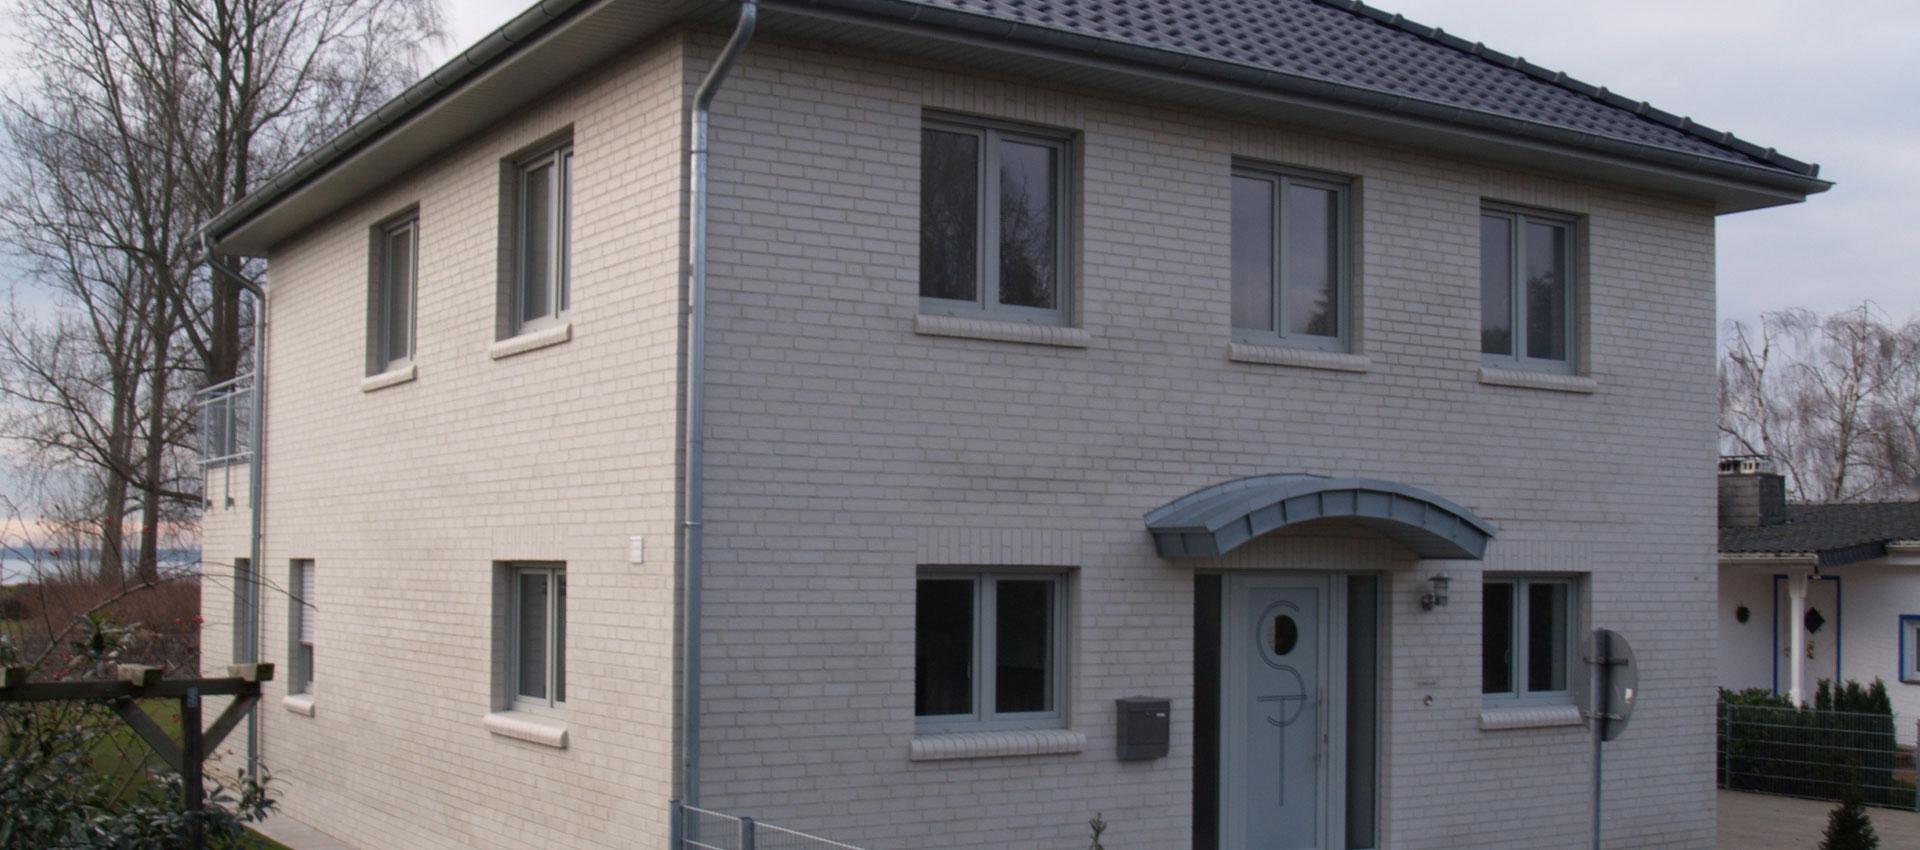 Haus im Bau PN1274